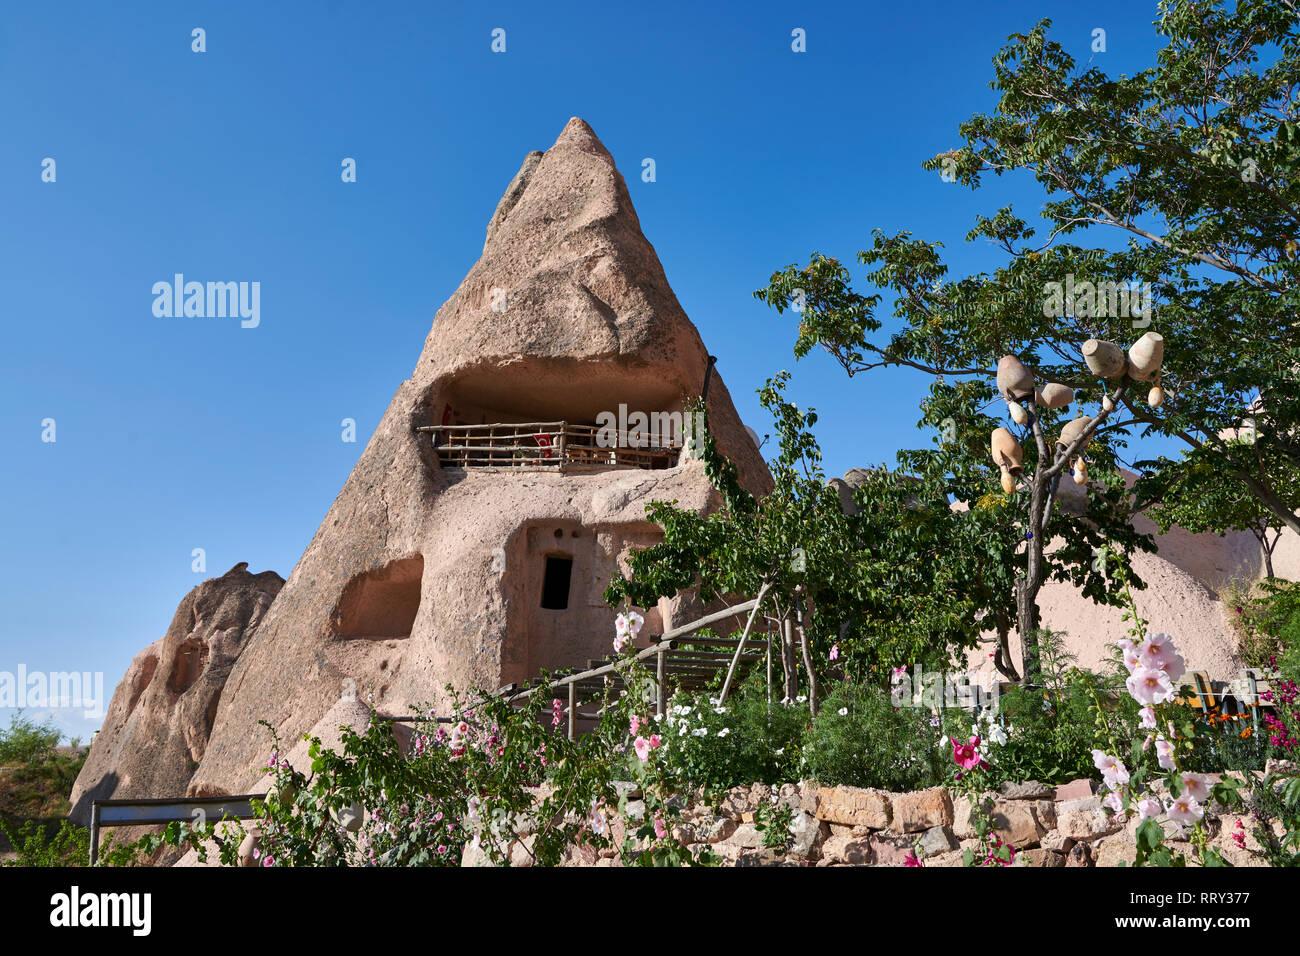 Cafeteria Balkonlu a typical fairy chimney cave house, Uchisar, near Goreme, Cappadocia, Nevsehir, Turkey - Stock Image